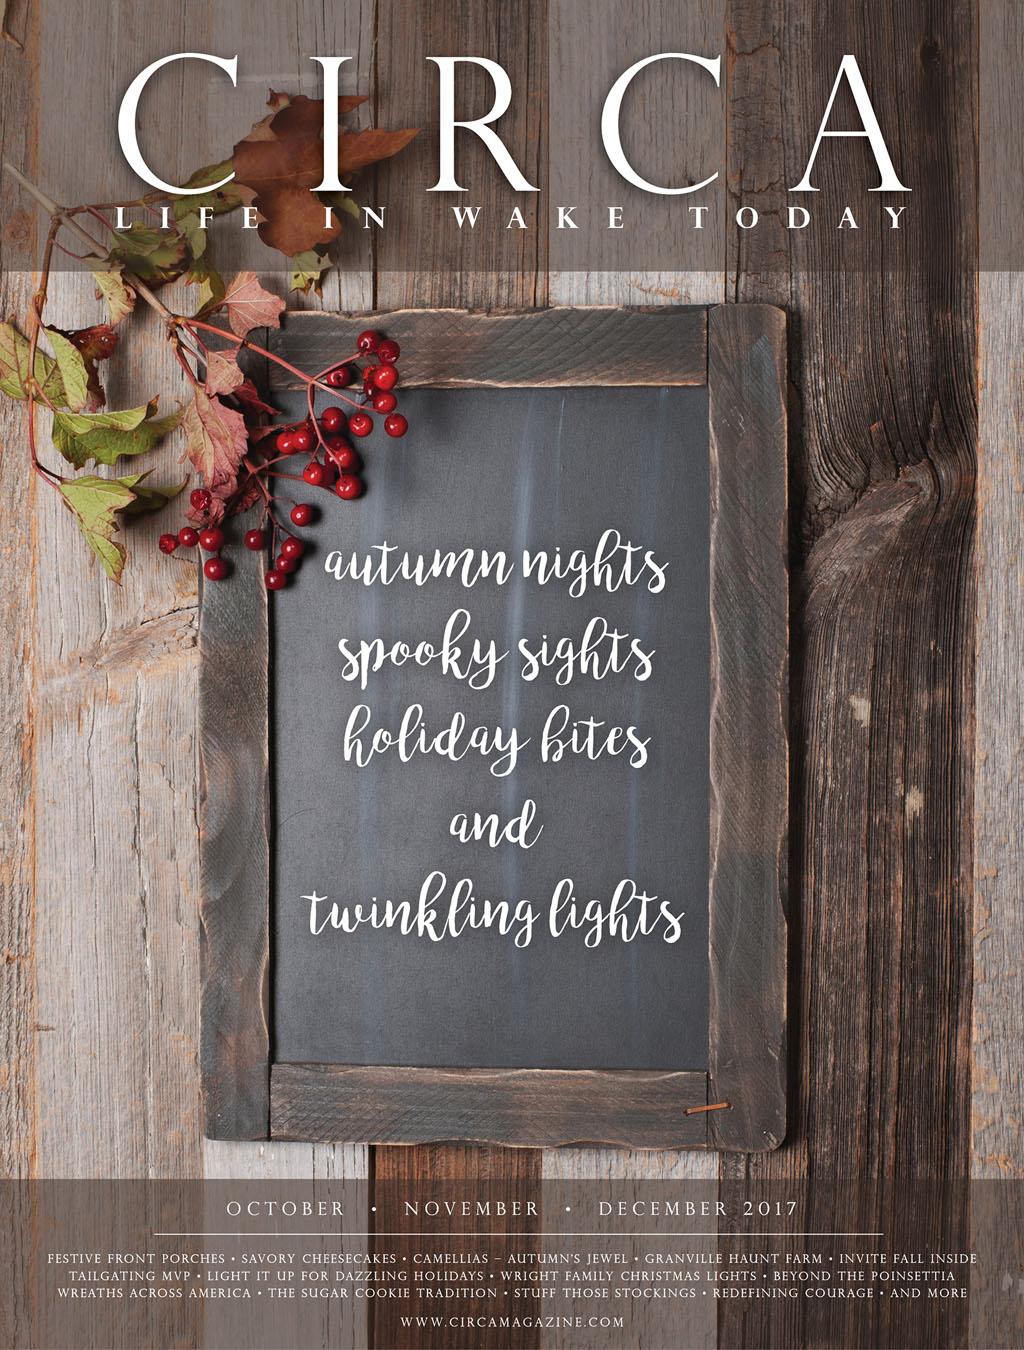 CIRCA Magazine | Past Issues